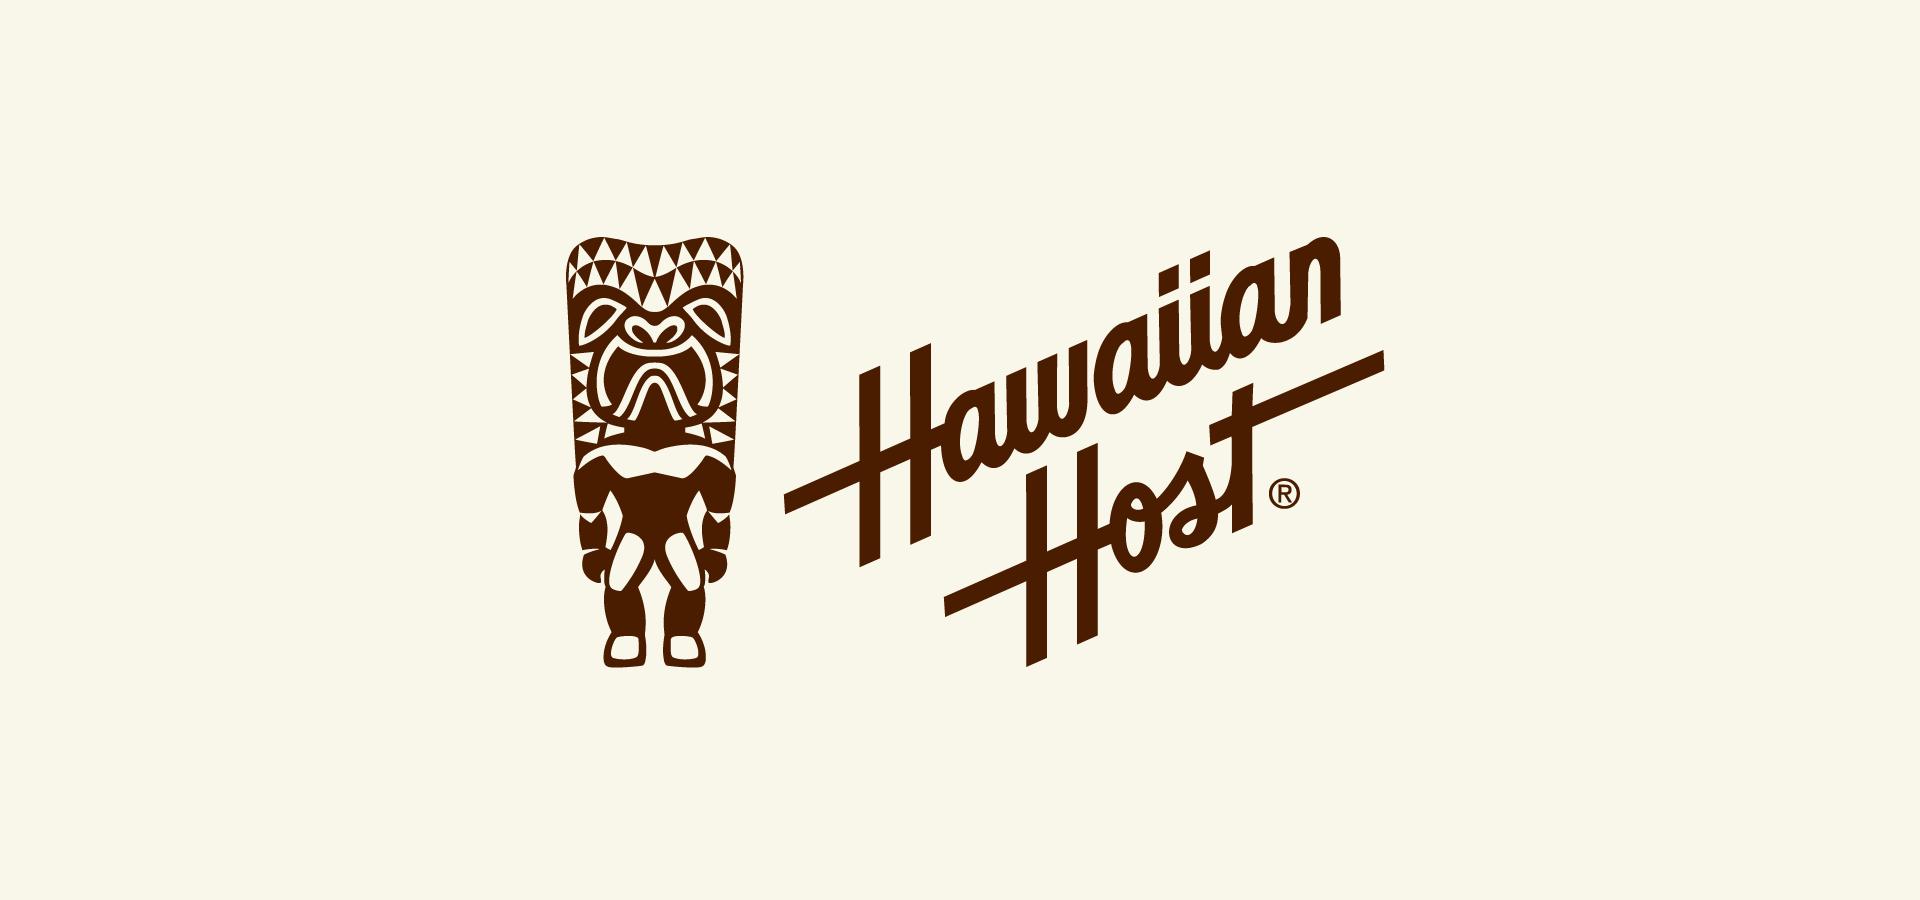 HawaiianHost_logo_title